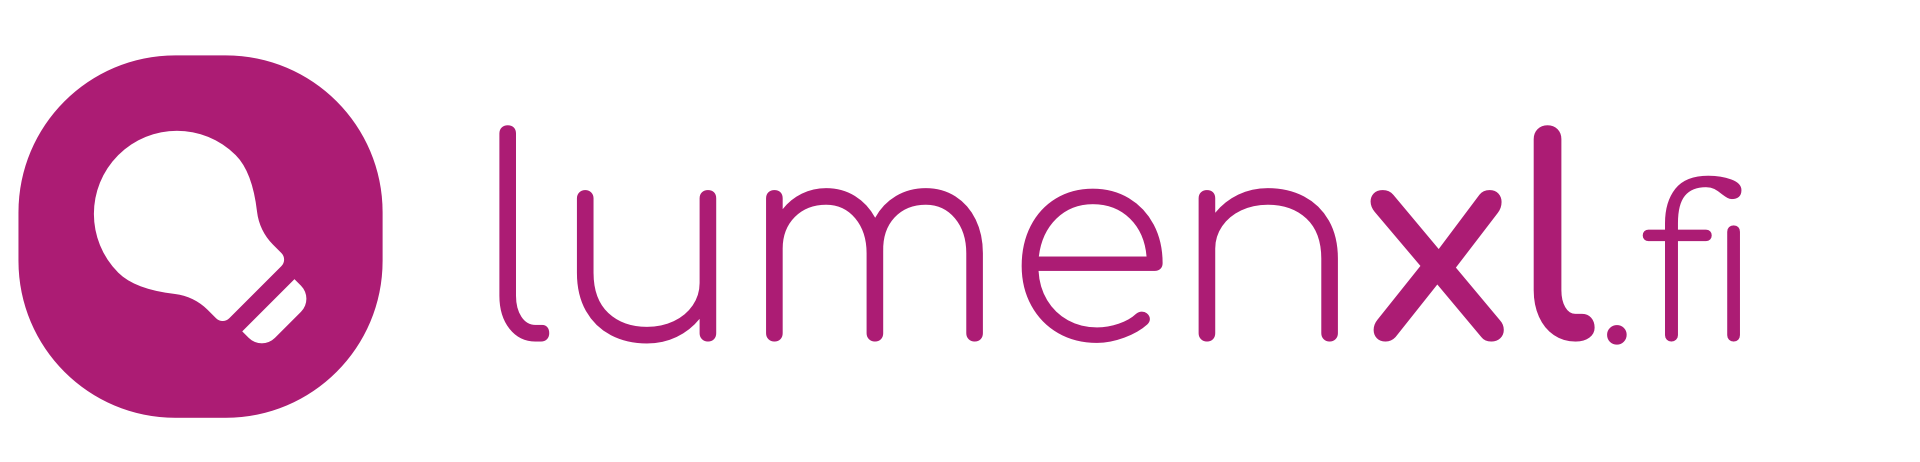 Lumenxl.fi